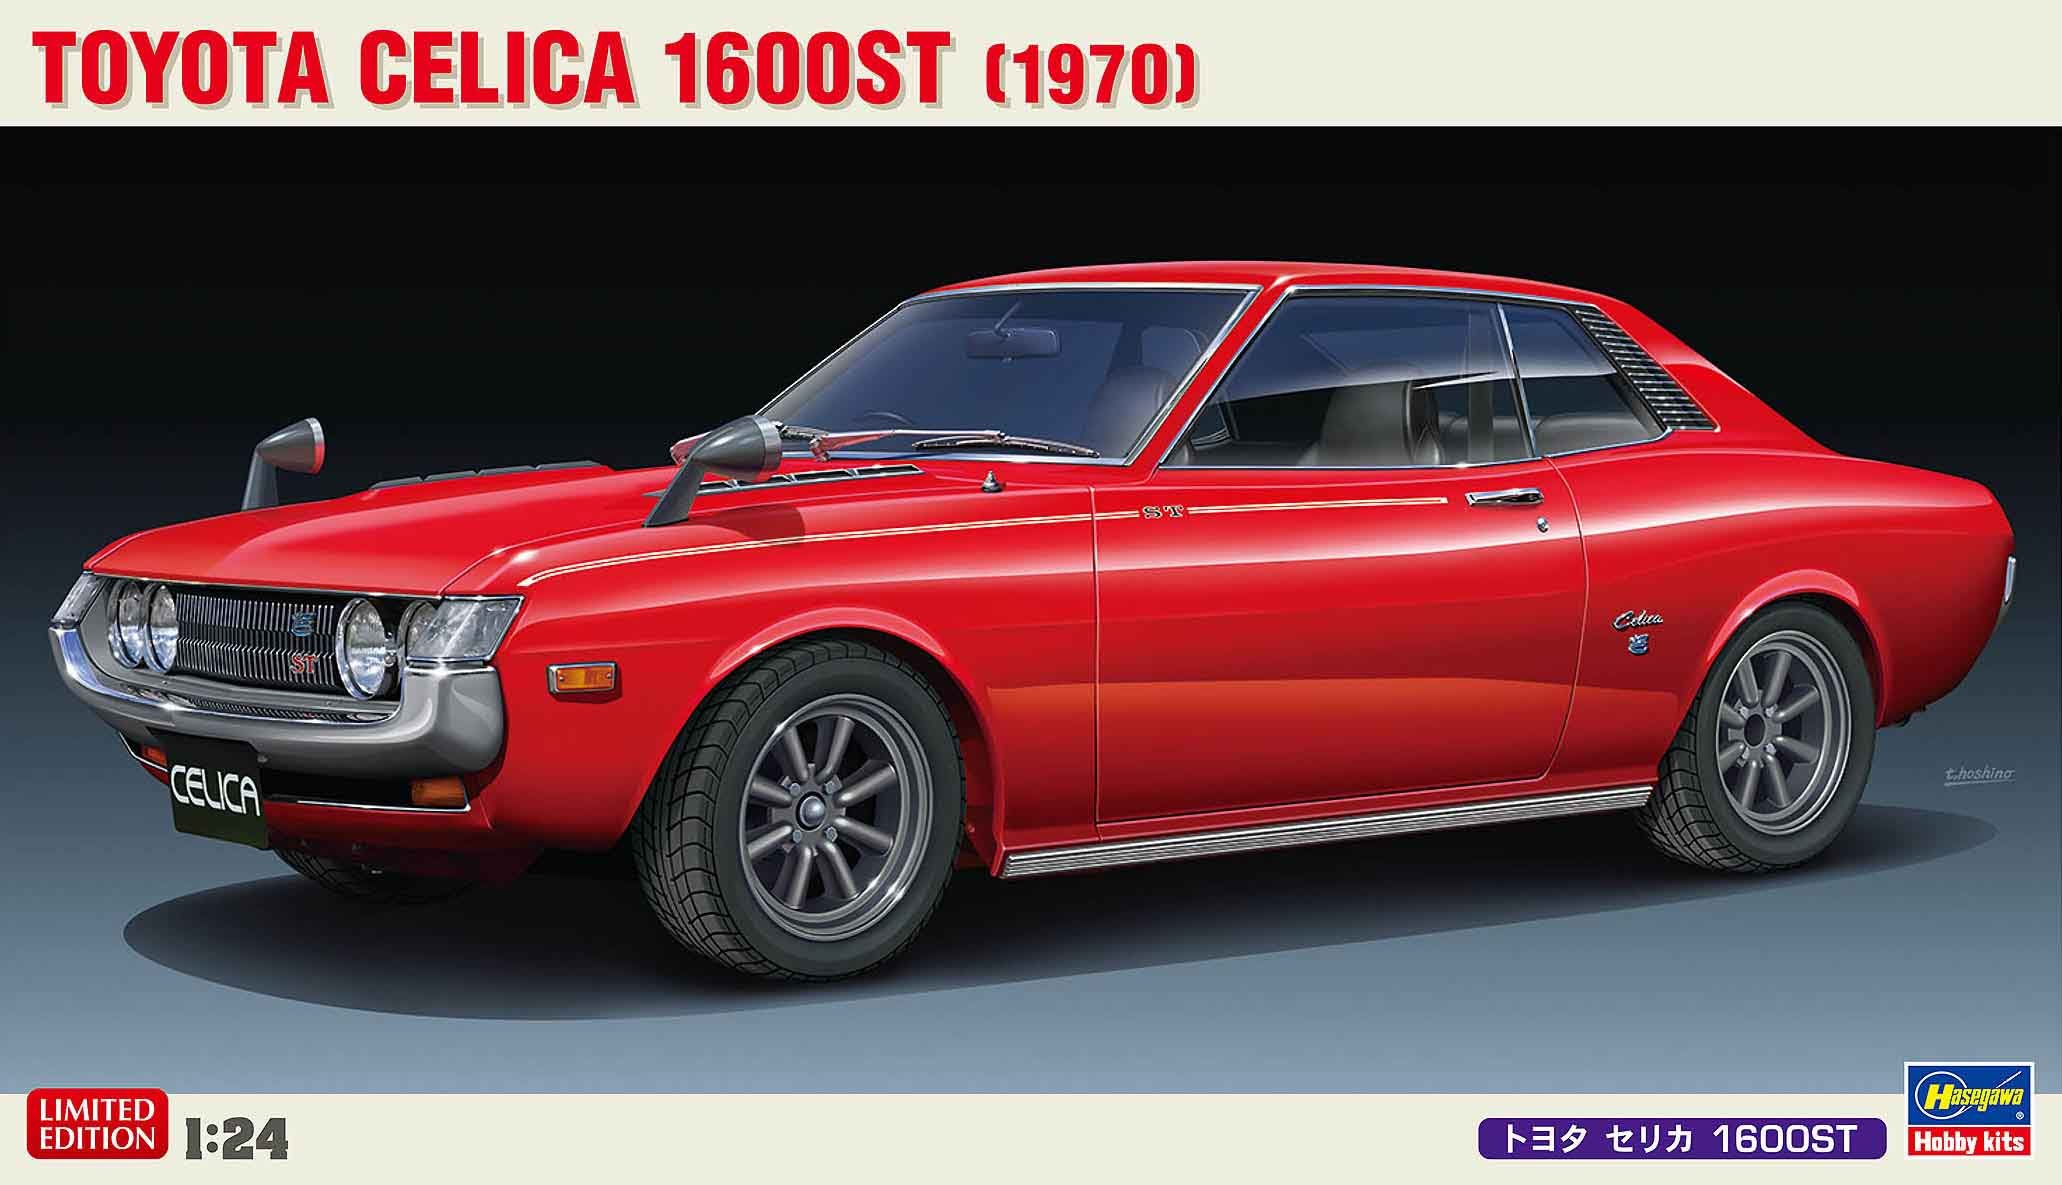 Hasegawa 1/24 Toyota Celica 1600ST